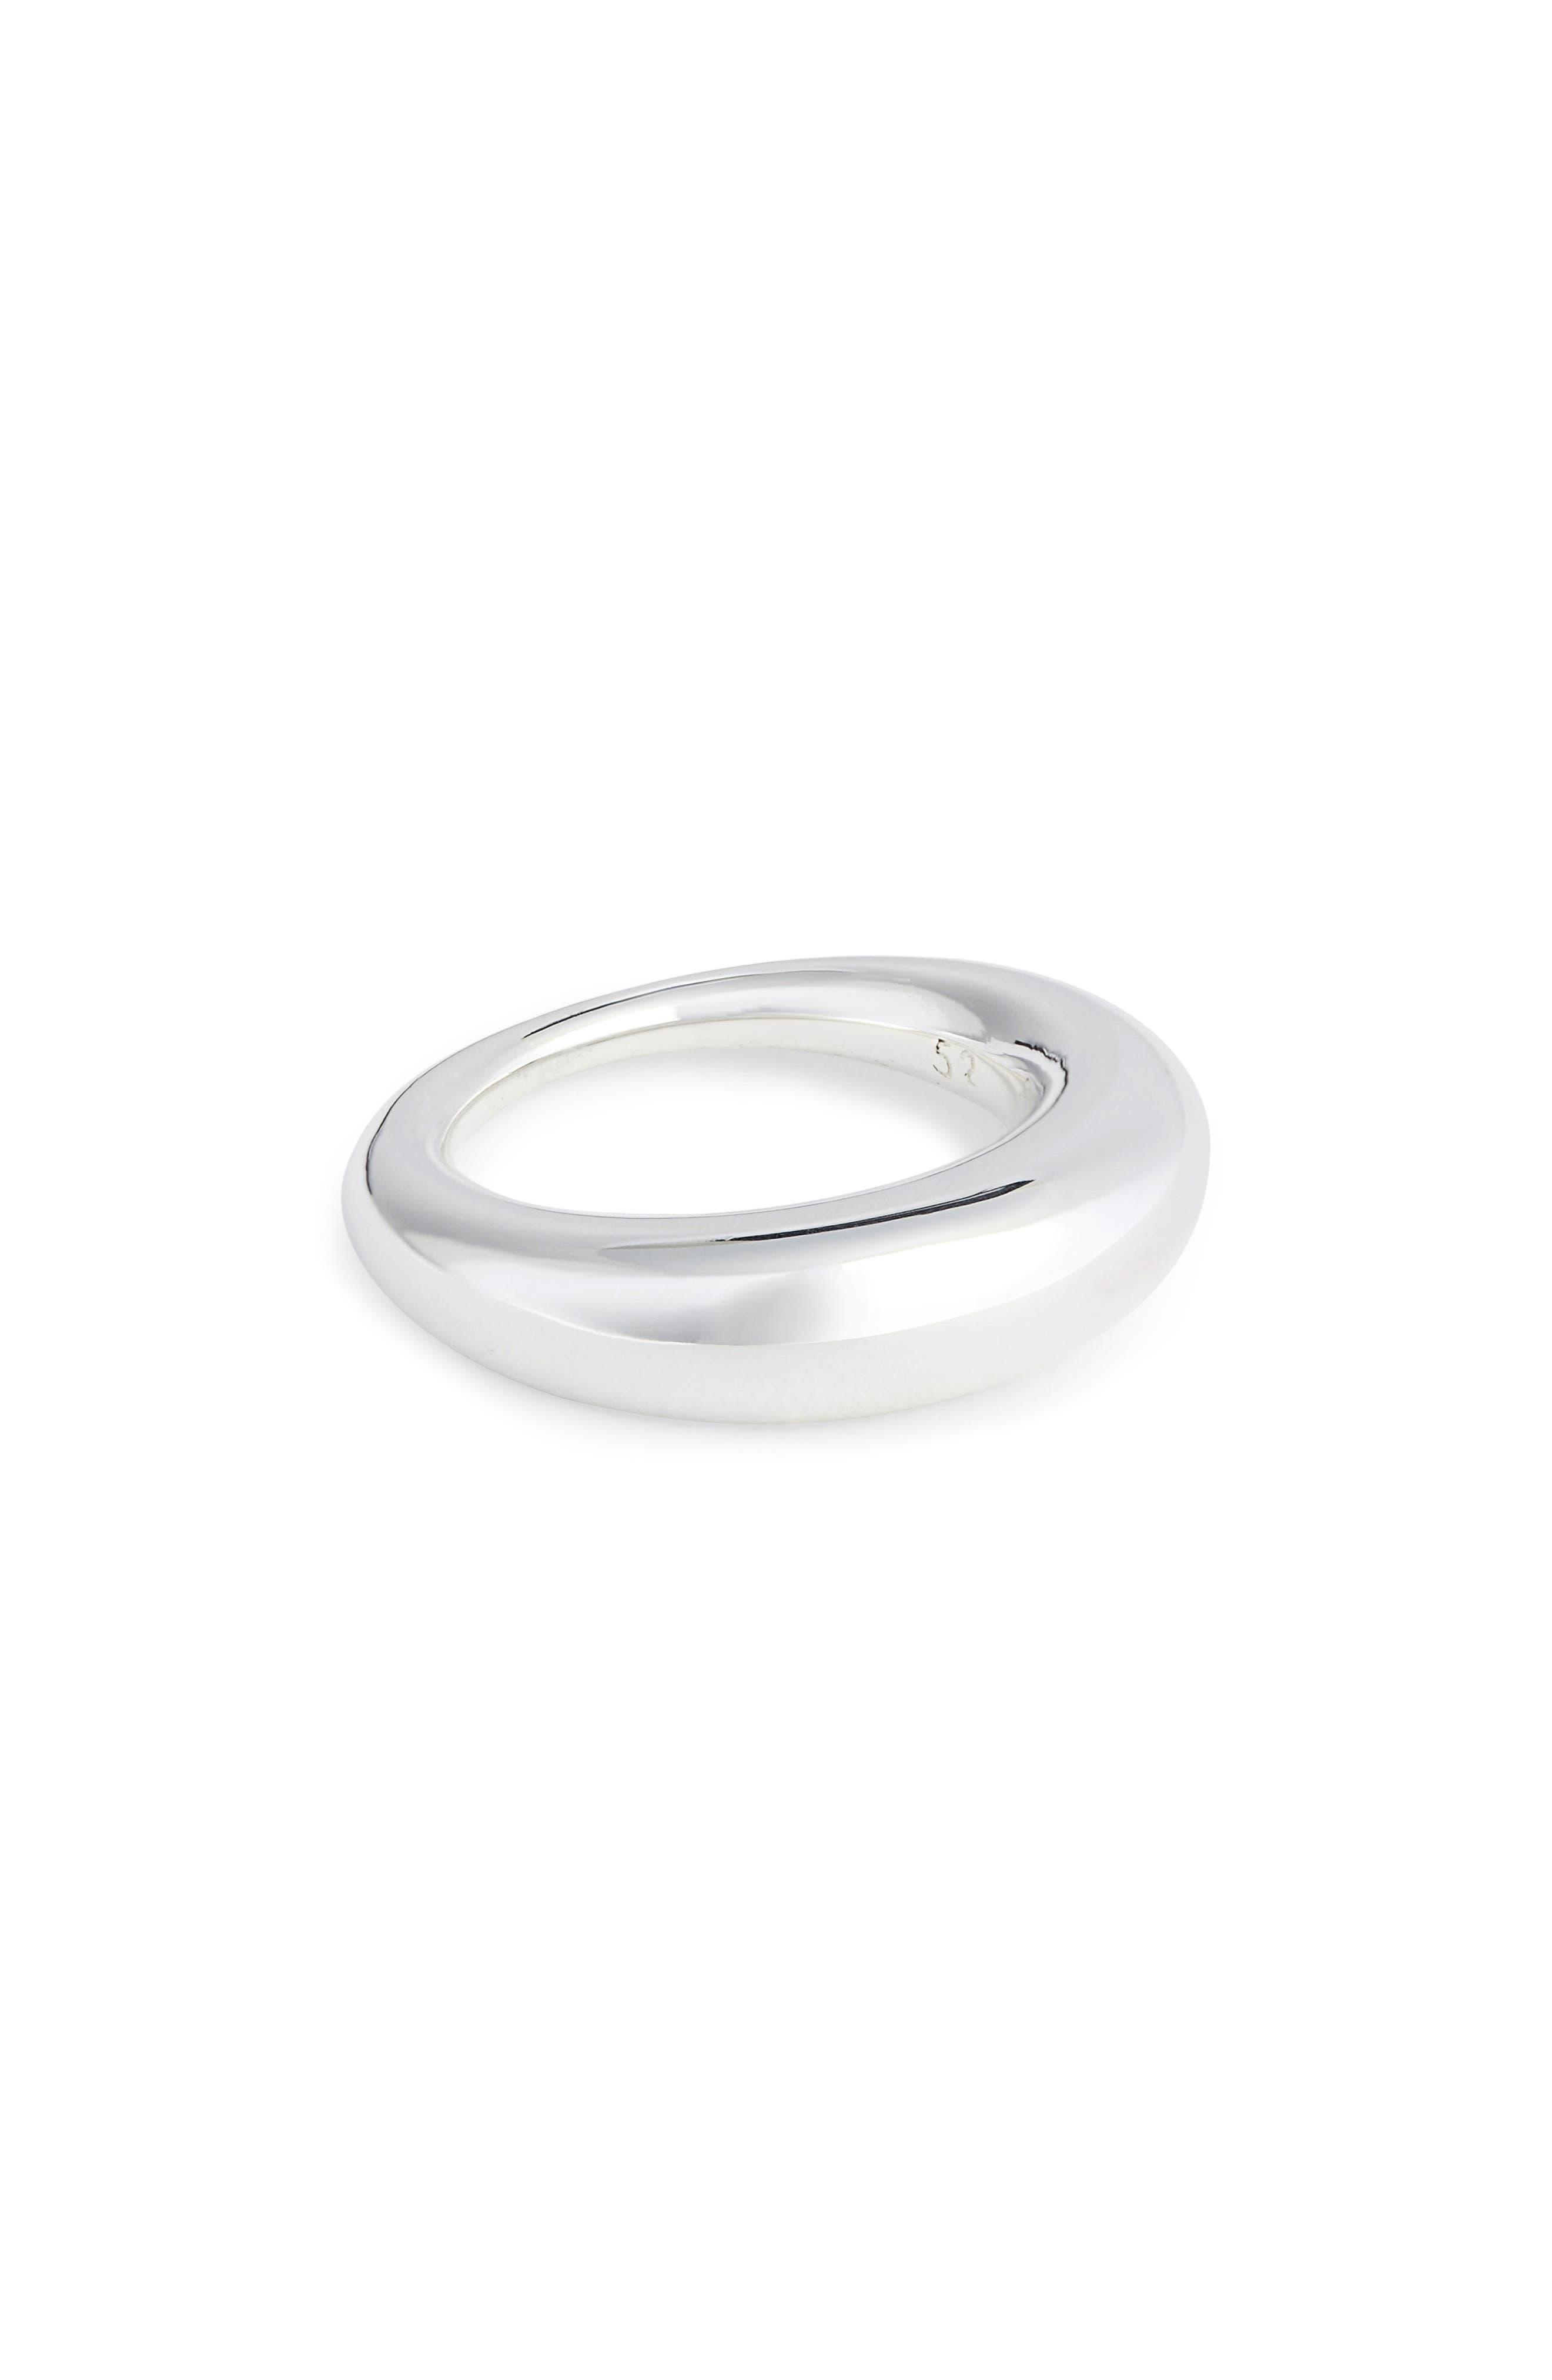 Large Snake Polished Silver Ring,                             Main thumbnail 1, color,                             POLISHED SILVER